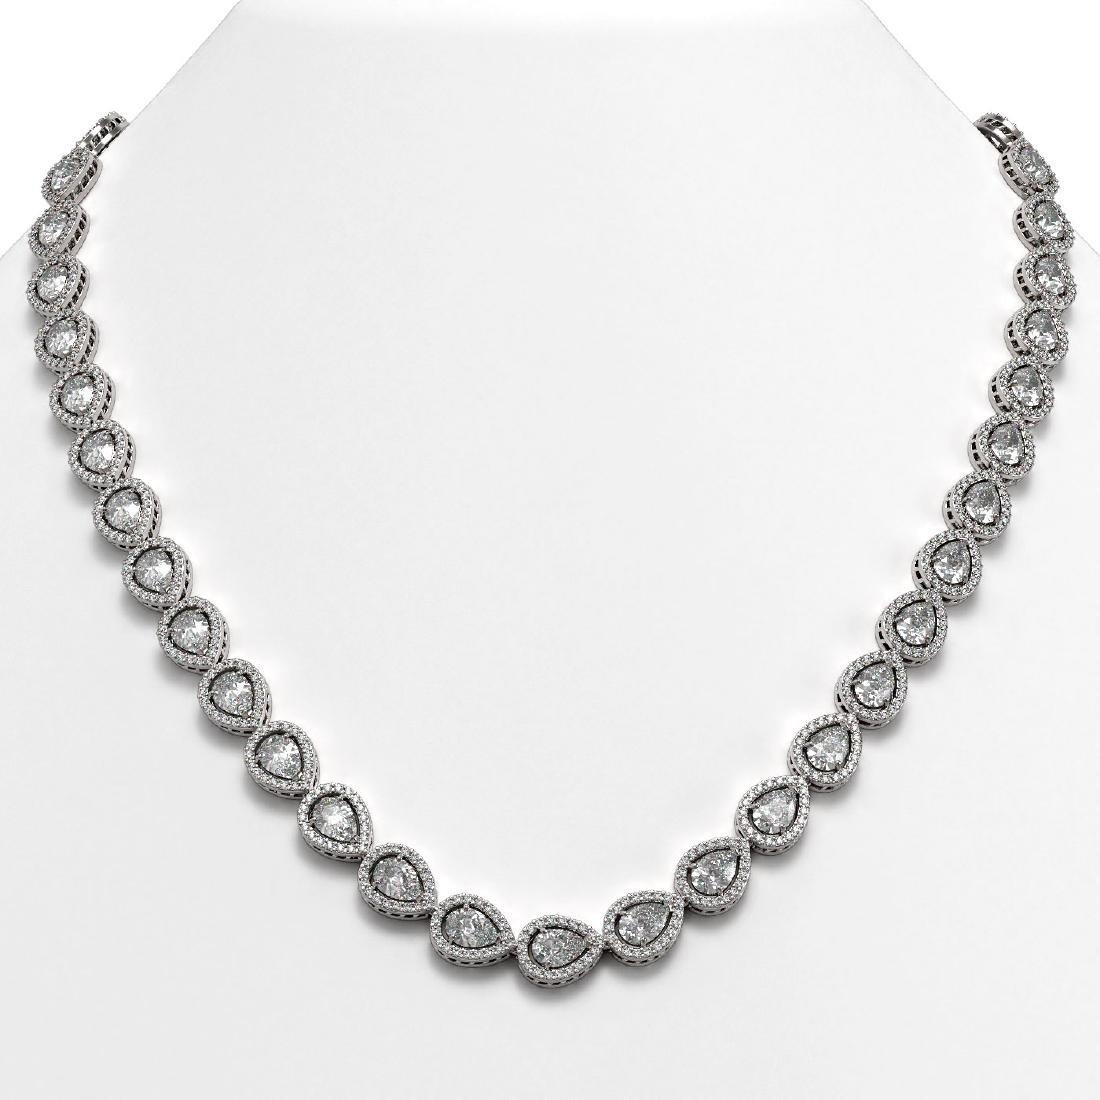 28.74 CTW Pear Diamond Designer Necklace 18K White Gold